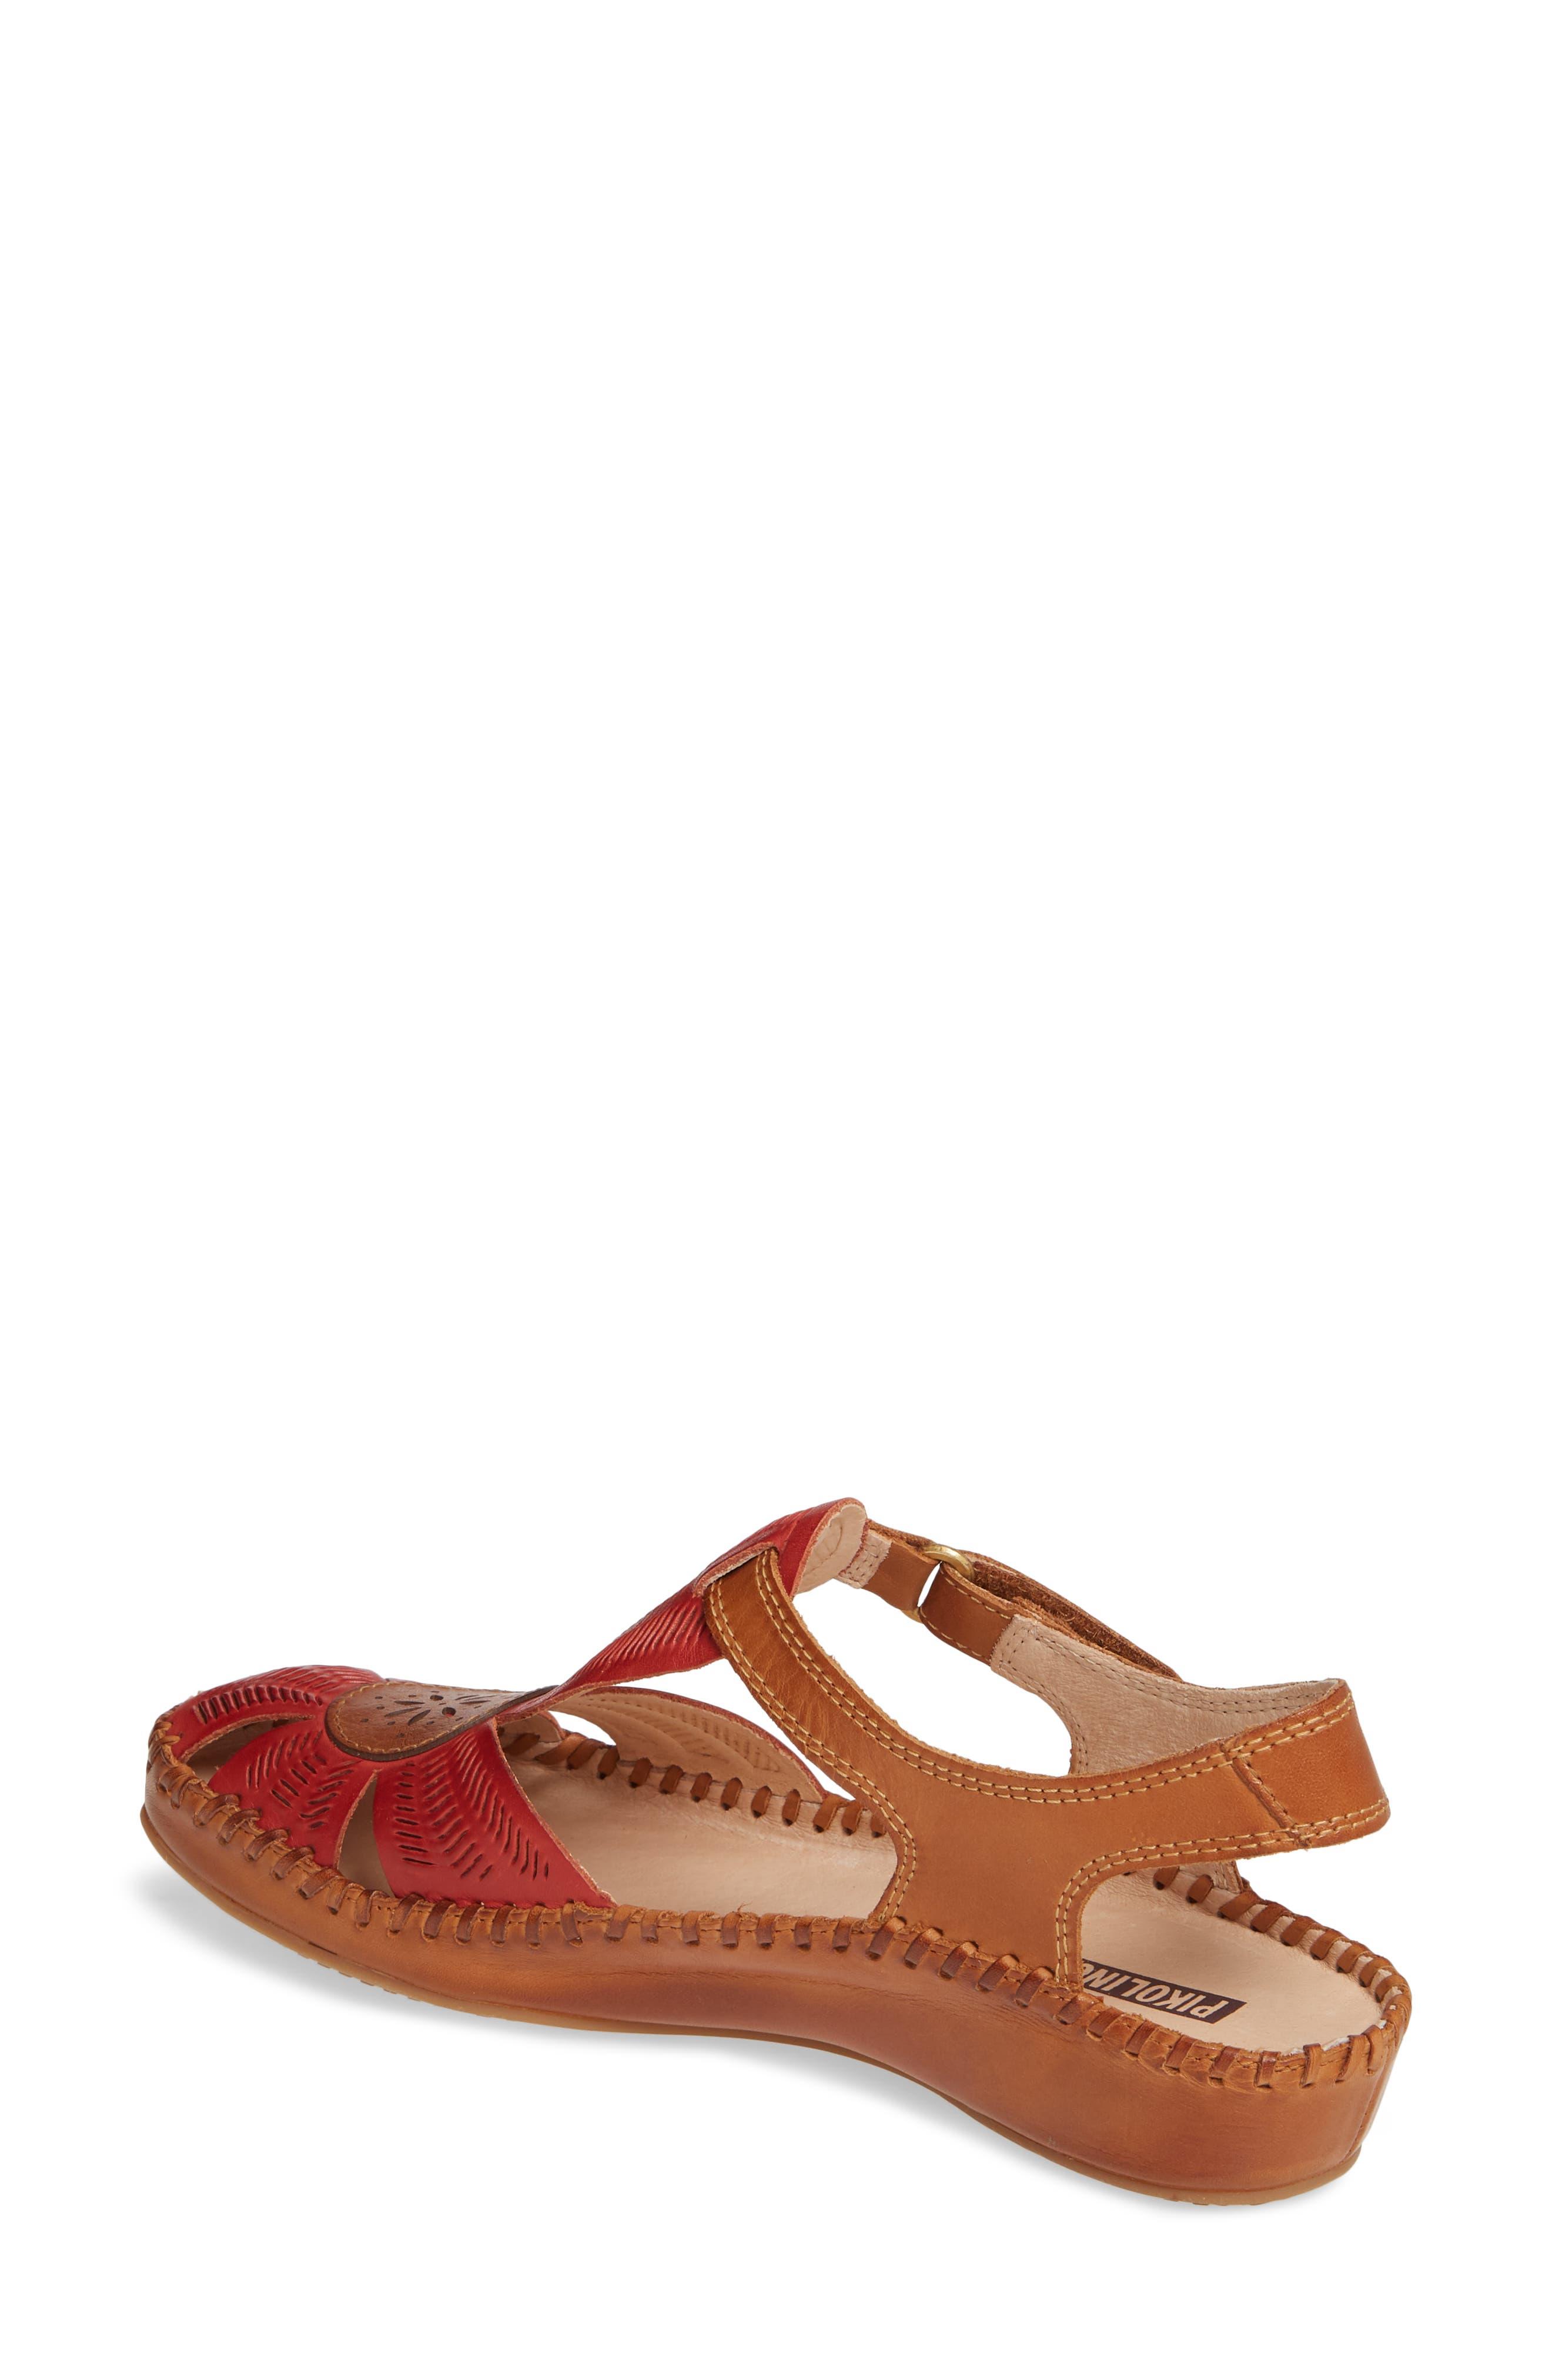 f6c15e0ec1ae Women s PIKOLINOS Sandals